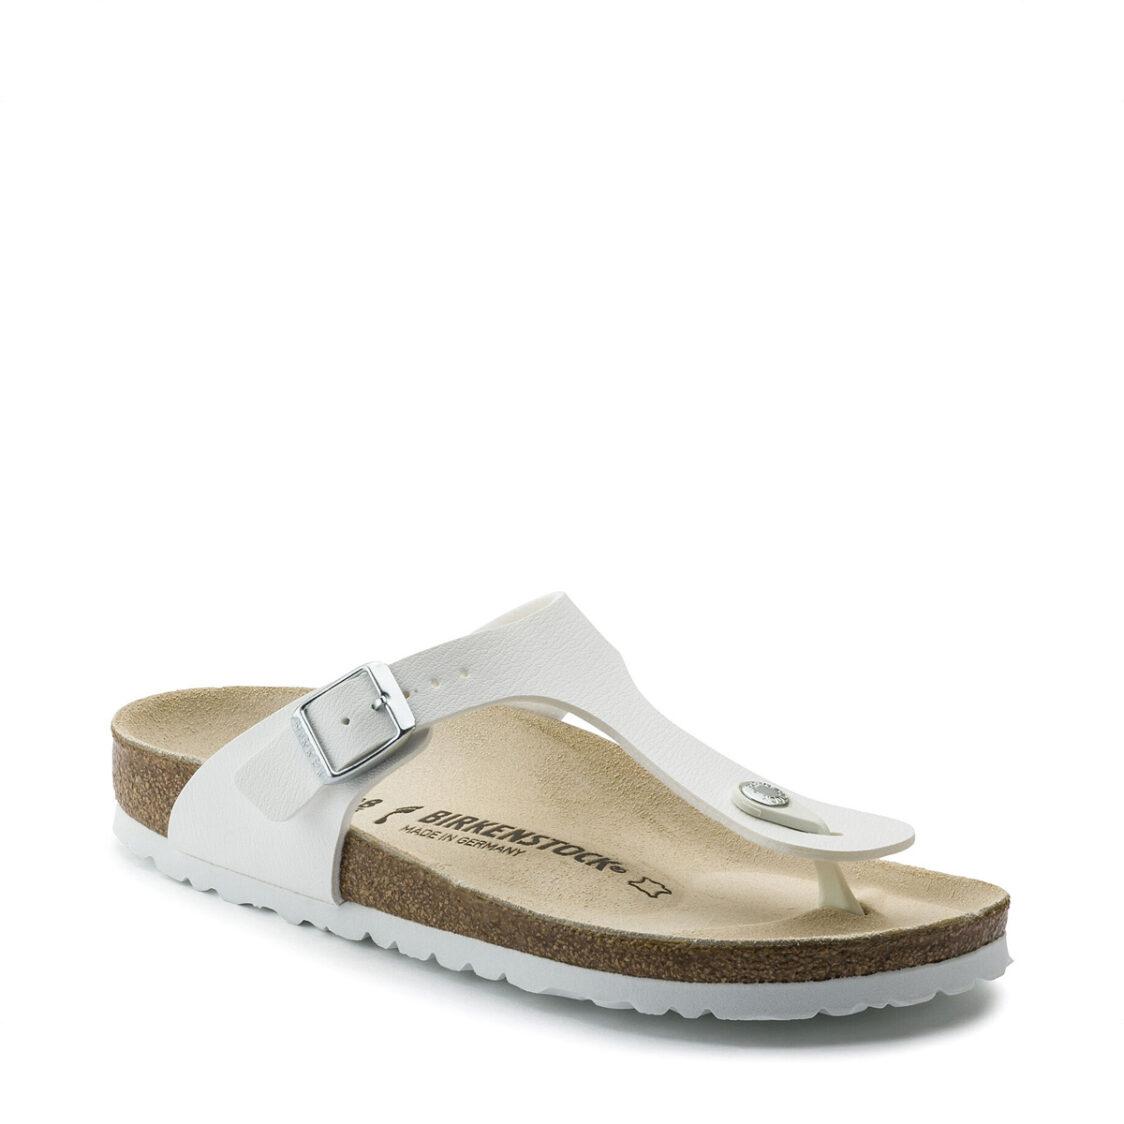 Birkenstock Gizeh Birko-Flor Unisex Regular Width Sandals White